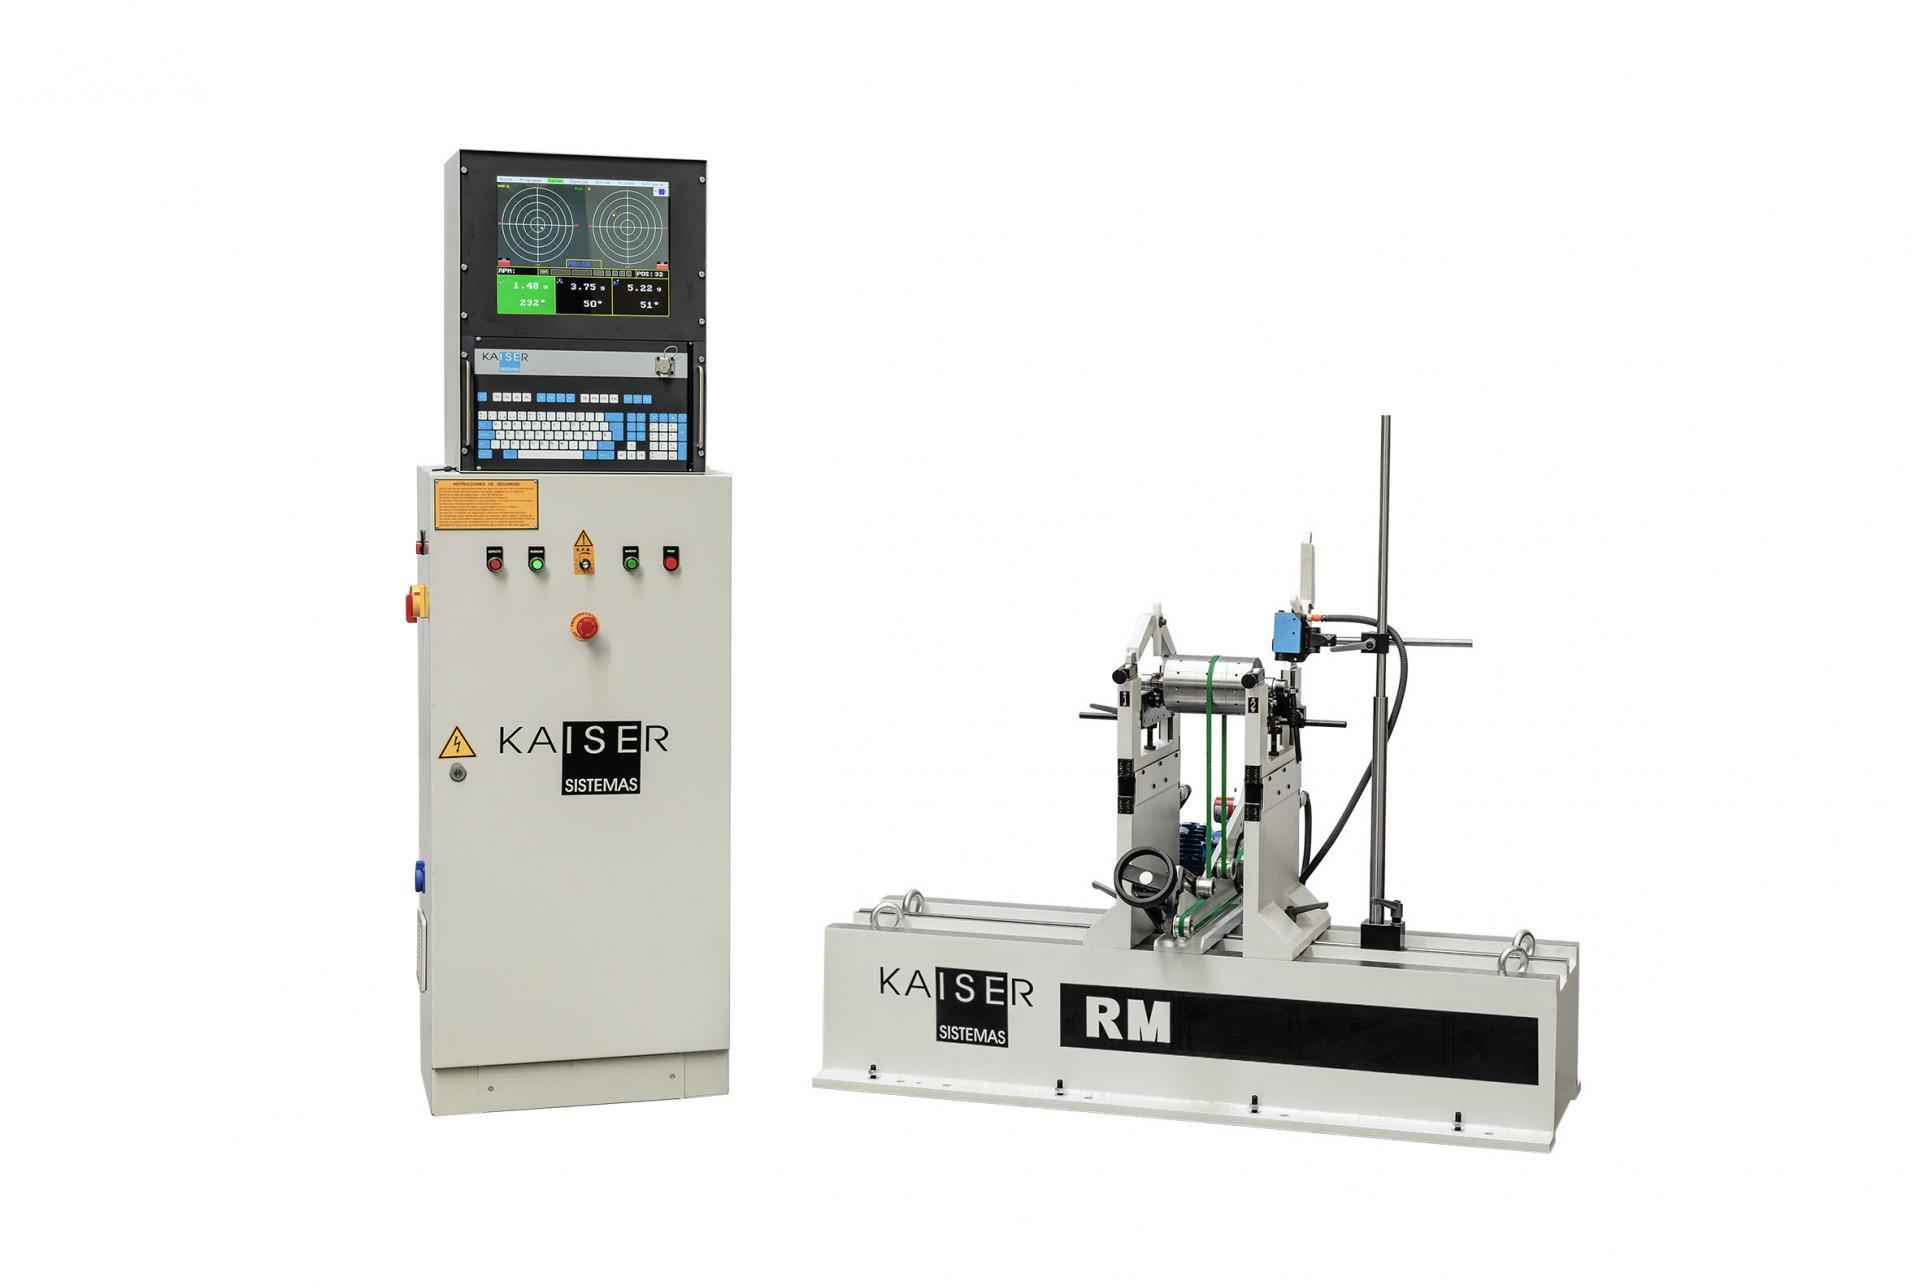 REF 02 - MODEL RM50.1 HORIZONTAL BALANCING MACHINE